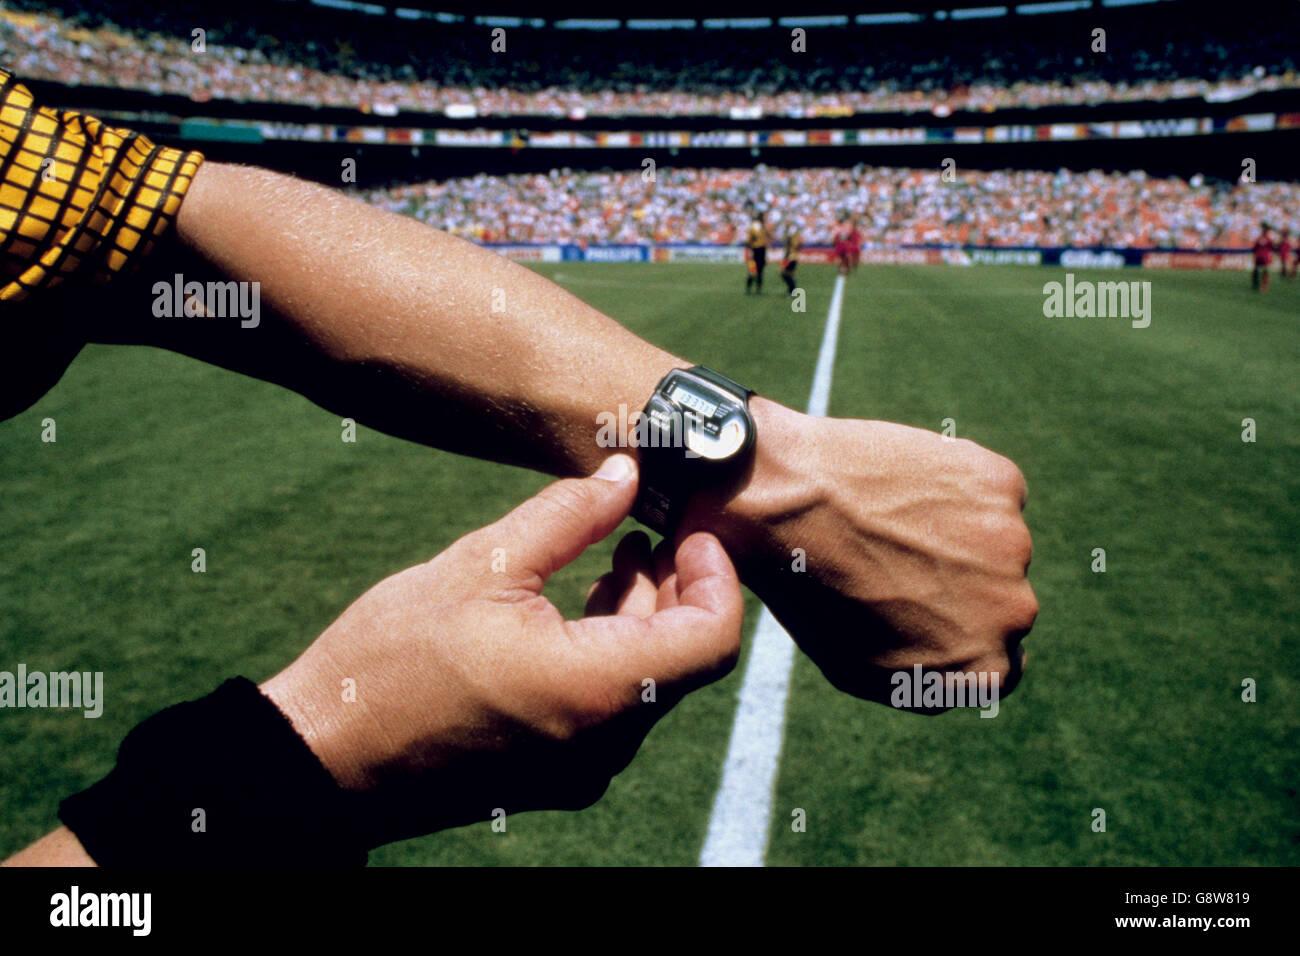 Soccer - World Cup USA 1994 - Group F - Belgium v Saudi Arabia - RFK Memorial Stadium - Stock Image